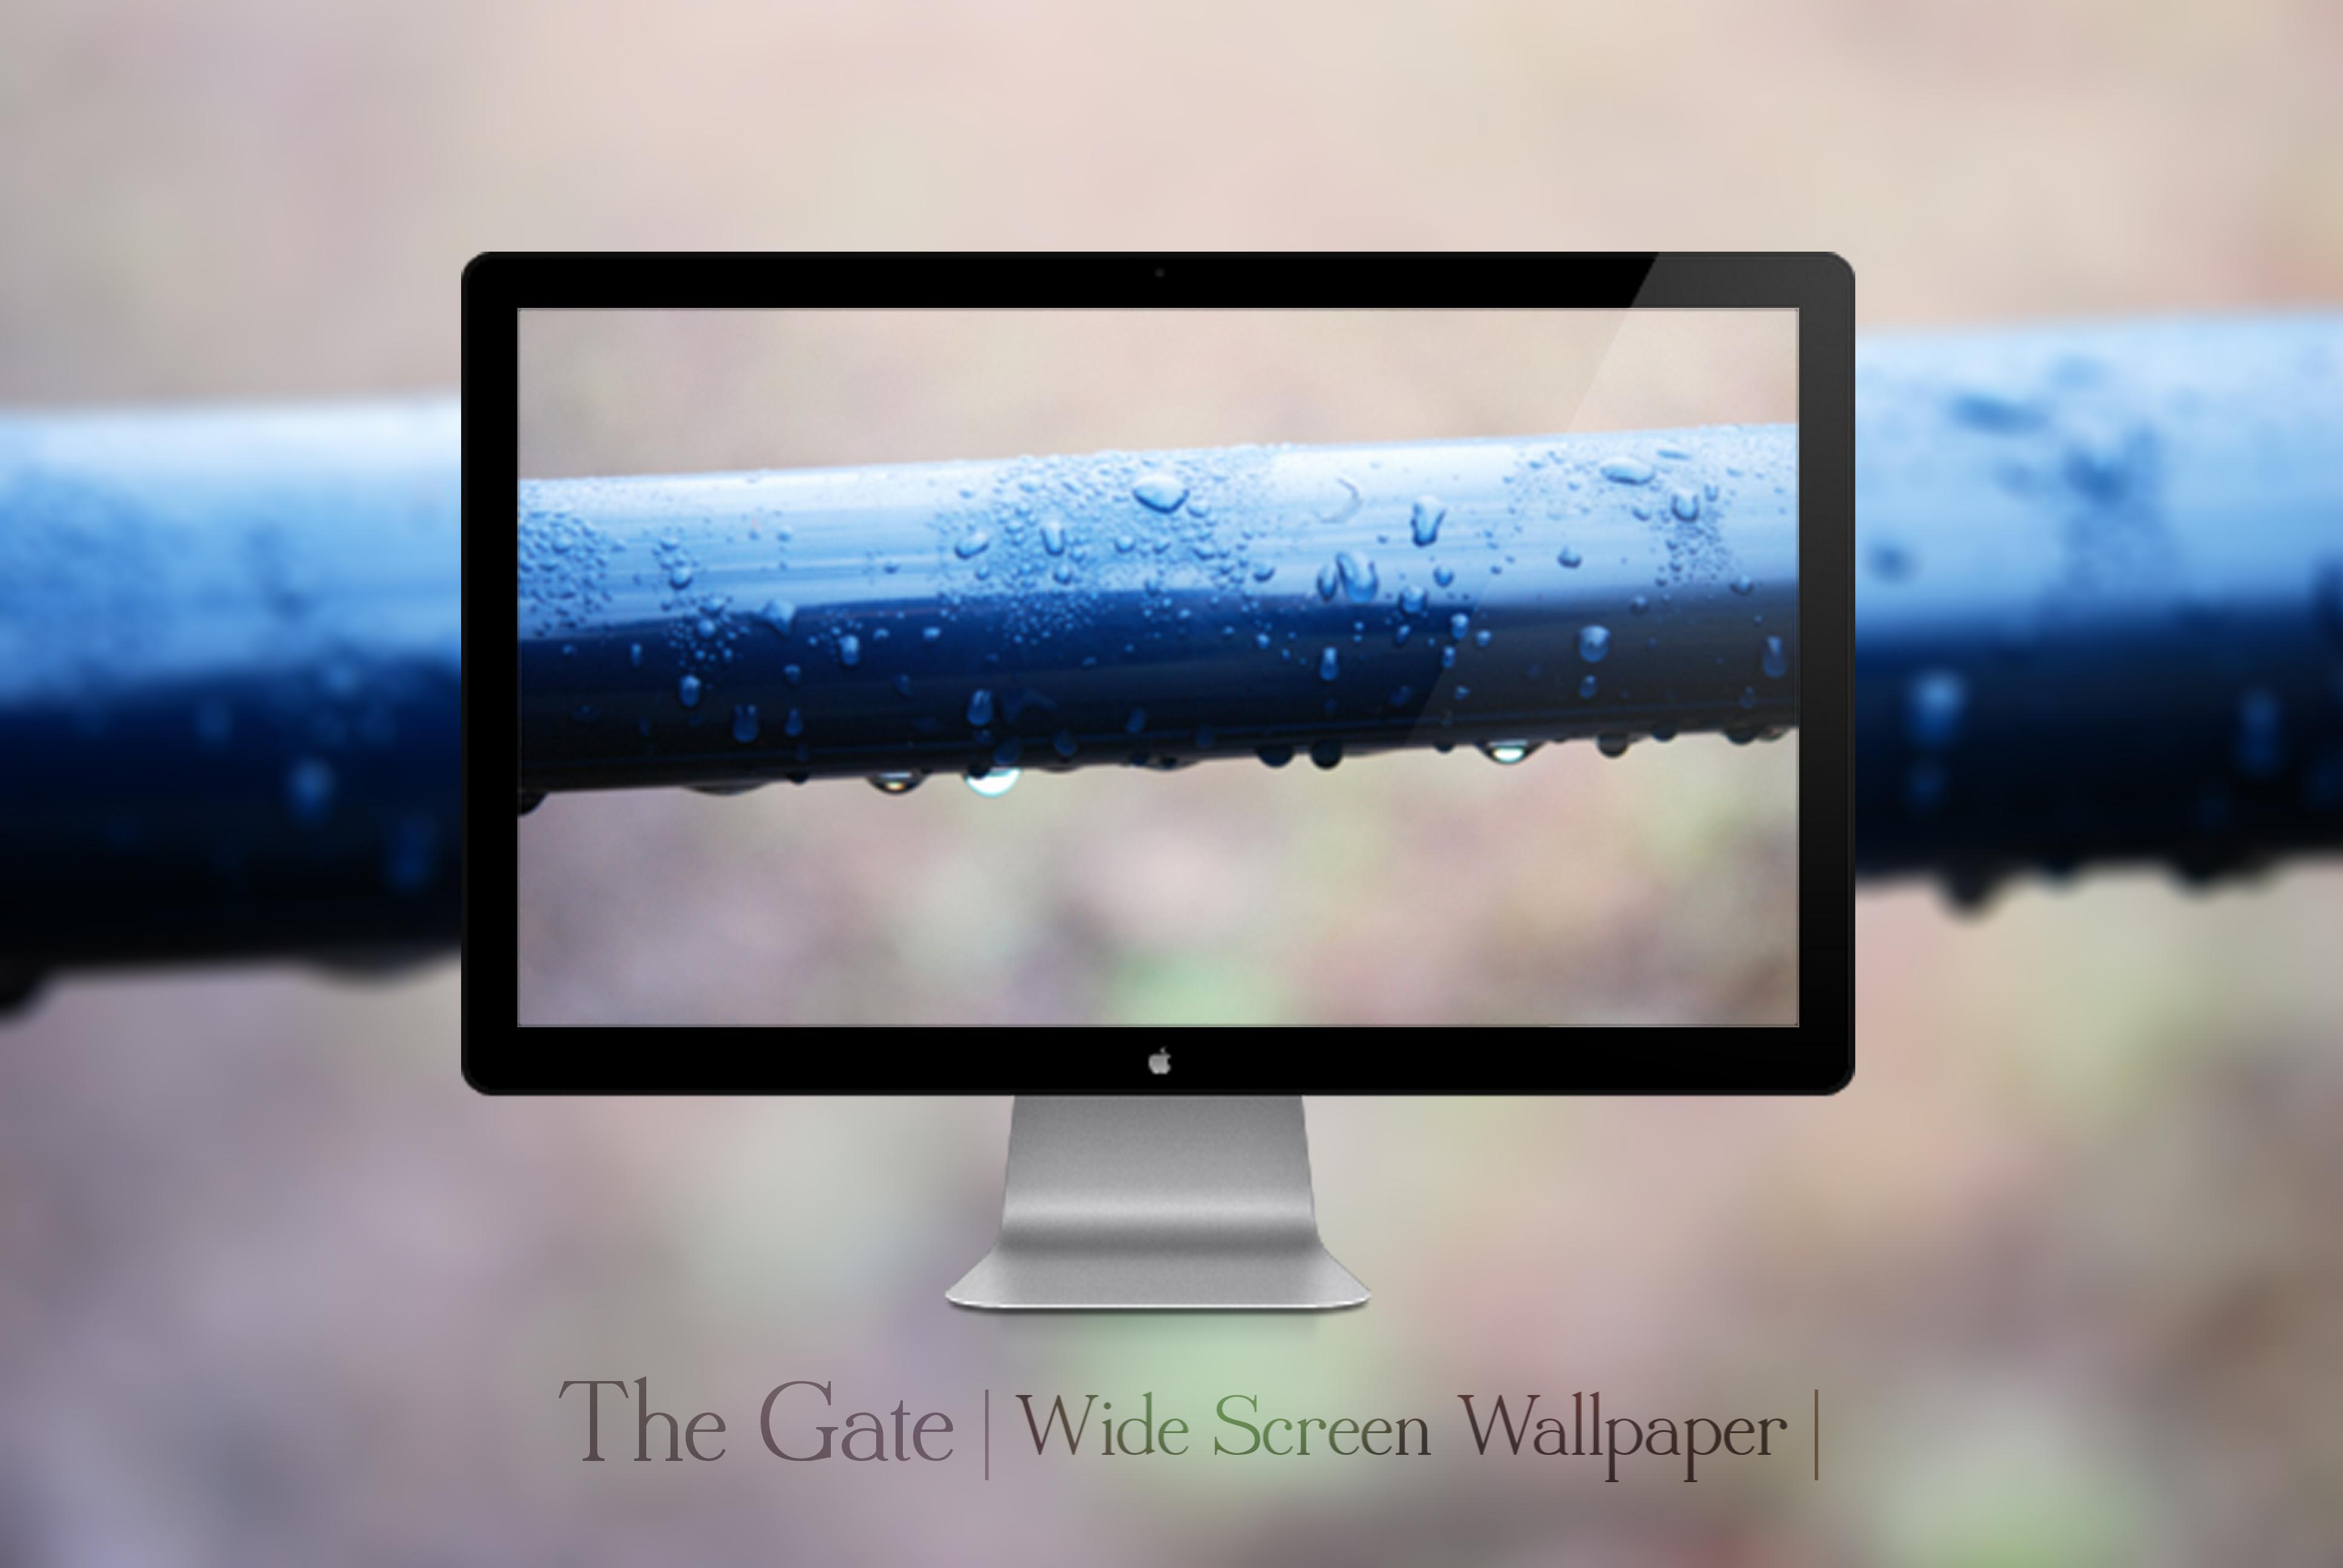 The Gate HD Wallpaper